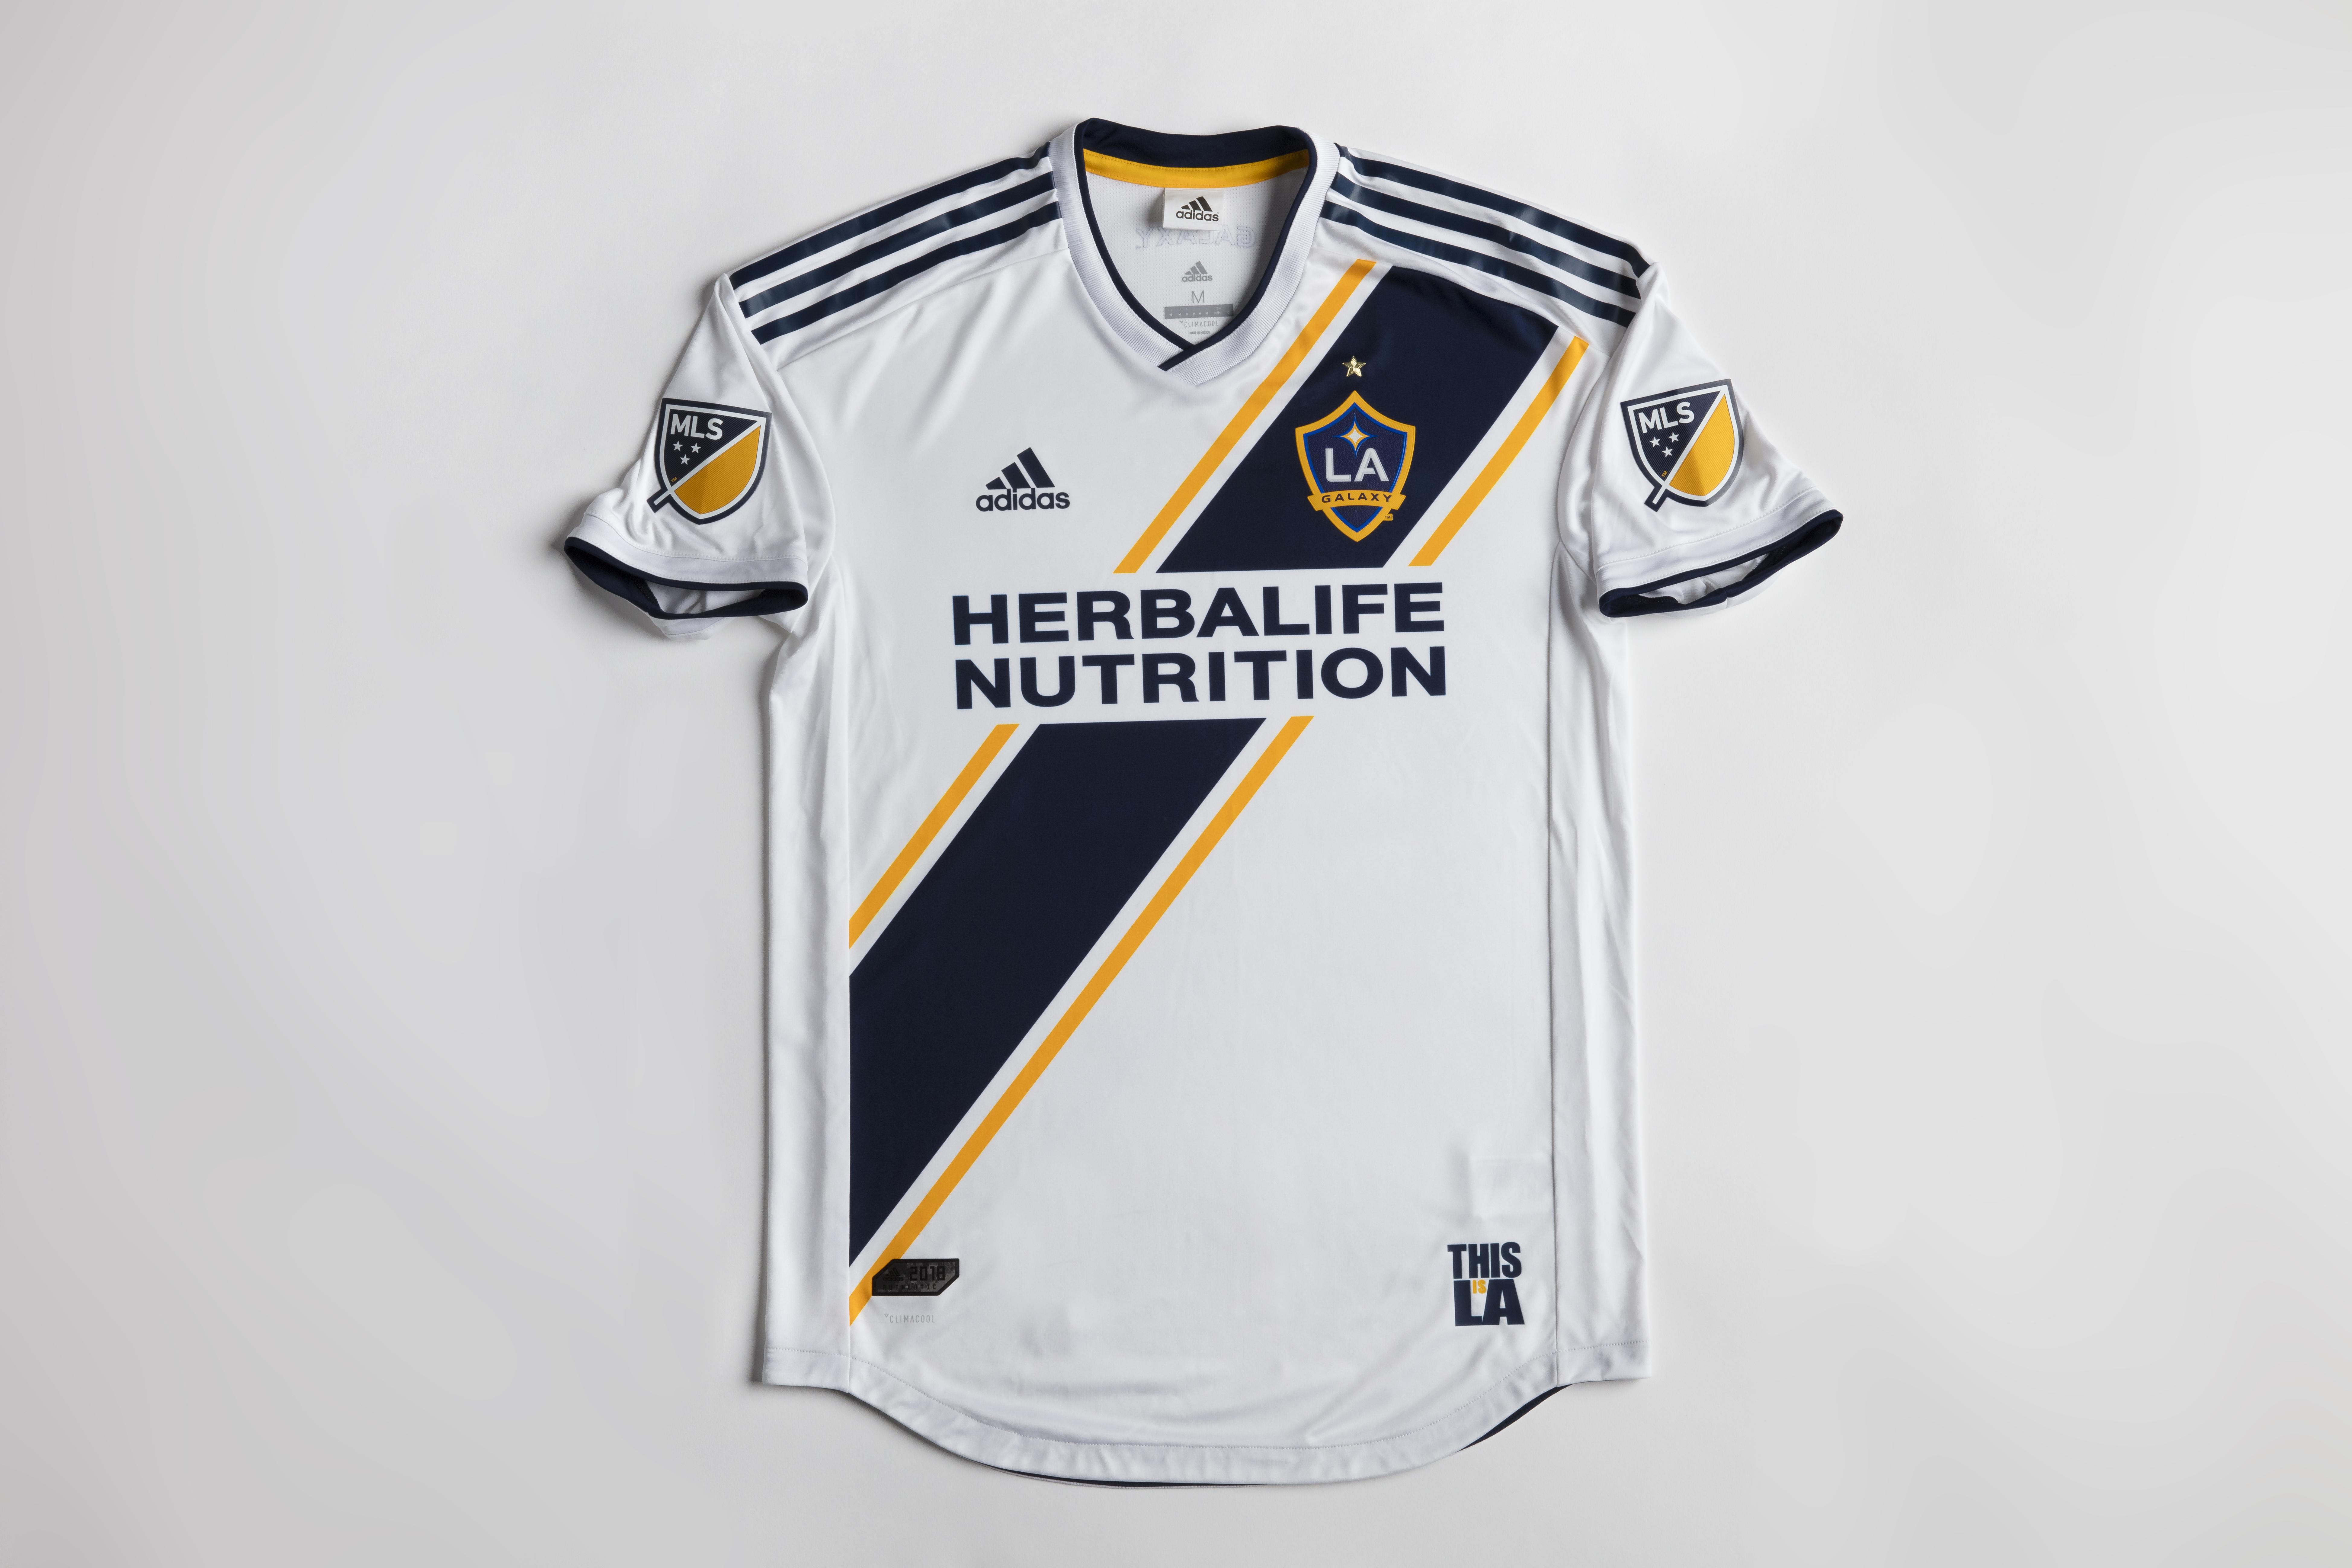 b3fdf9a16951 LA Galaxy unveil new 2018 primary jersey